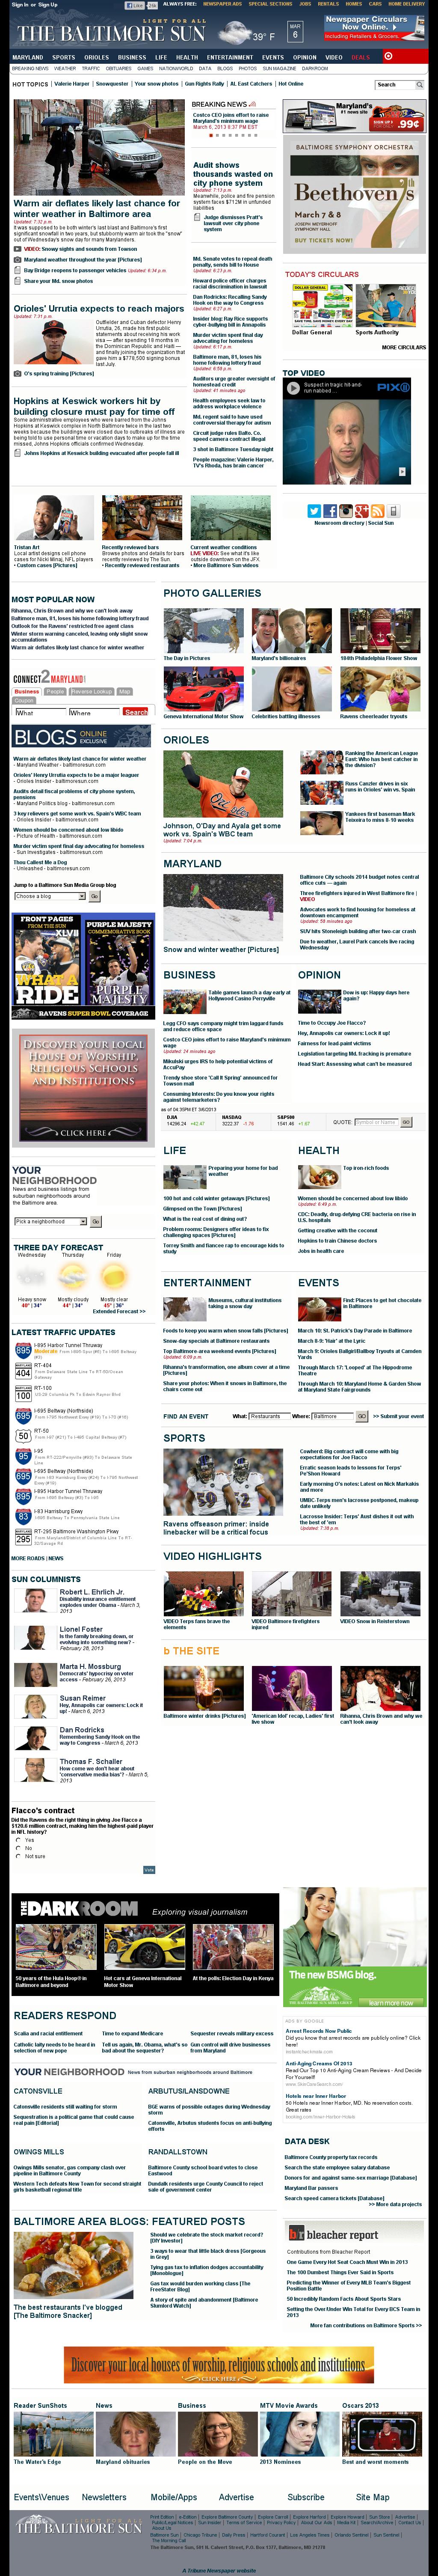 The Baltimore Sun at Thursday March 7, 2013, 2:01 a.m. UTC